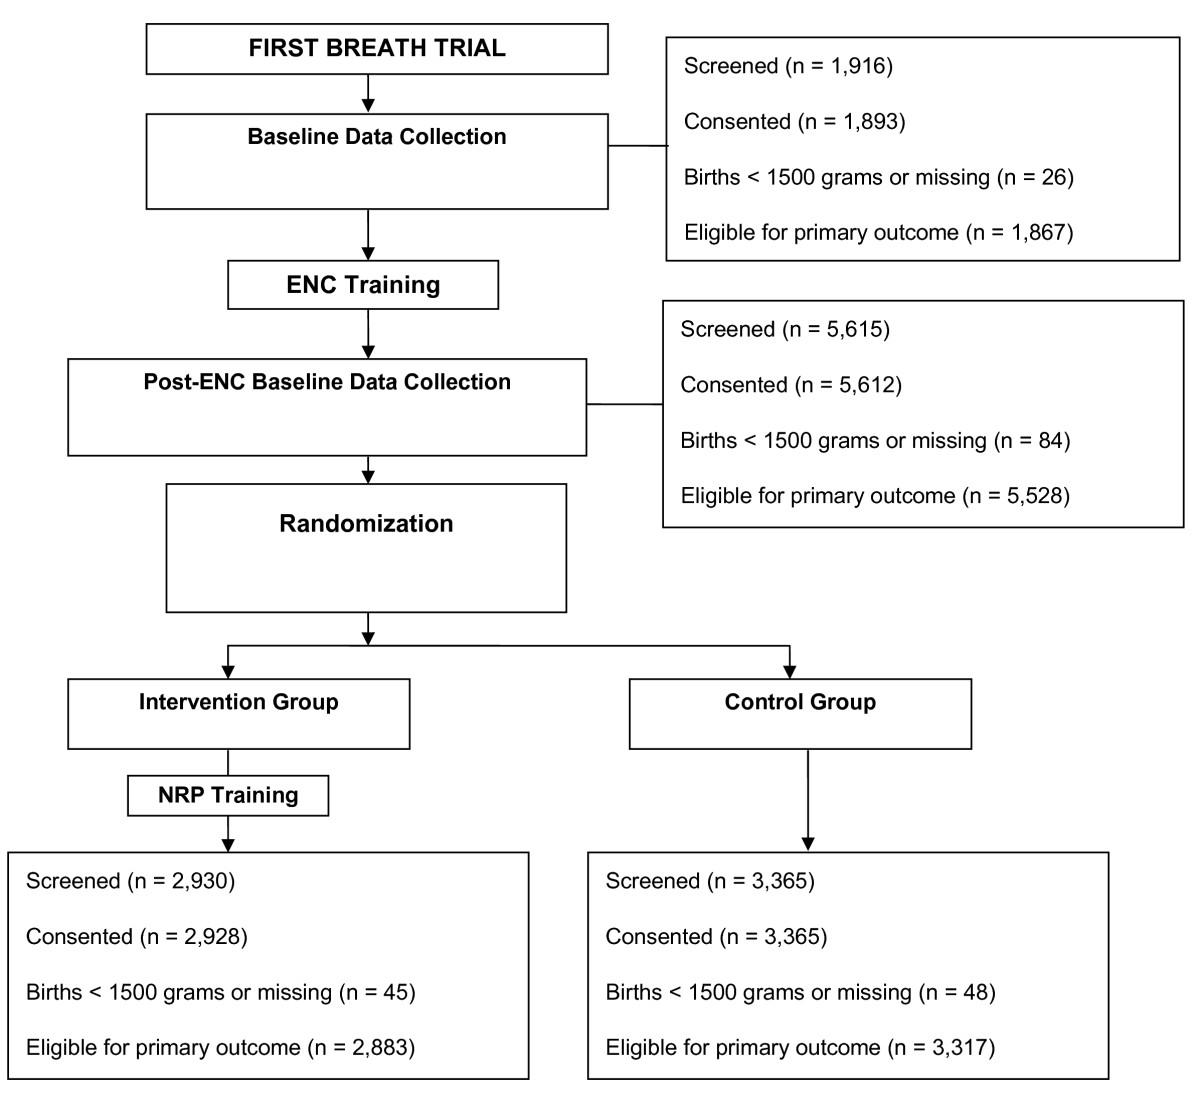 Reduced perinatal mortality following enhanced training of